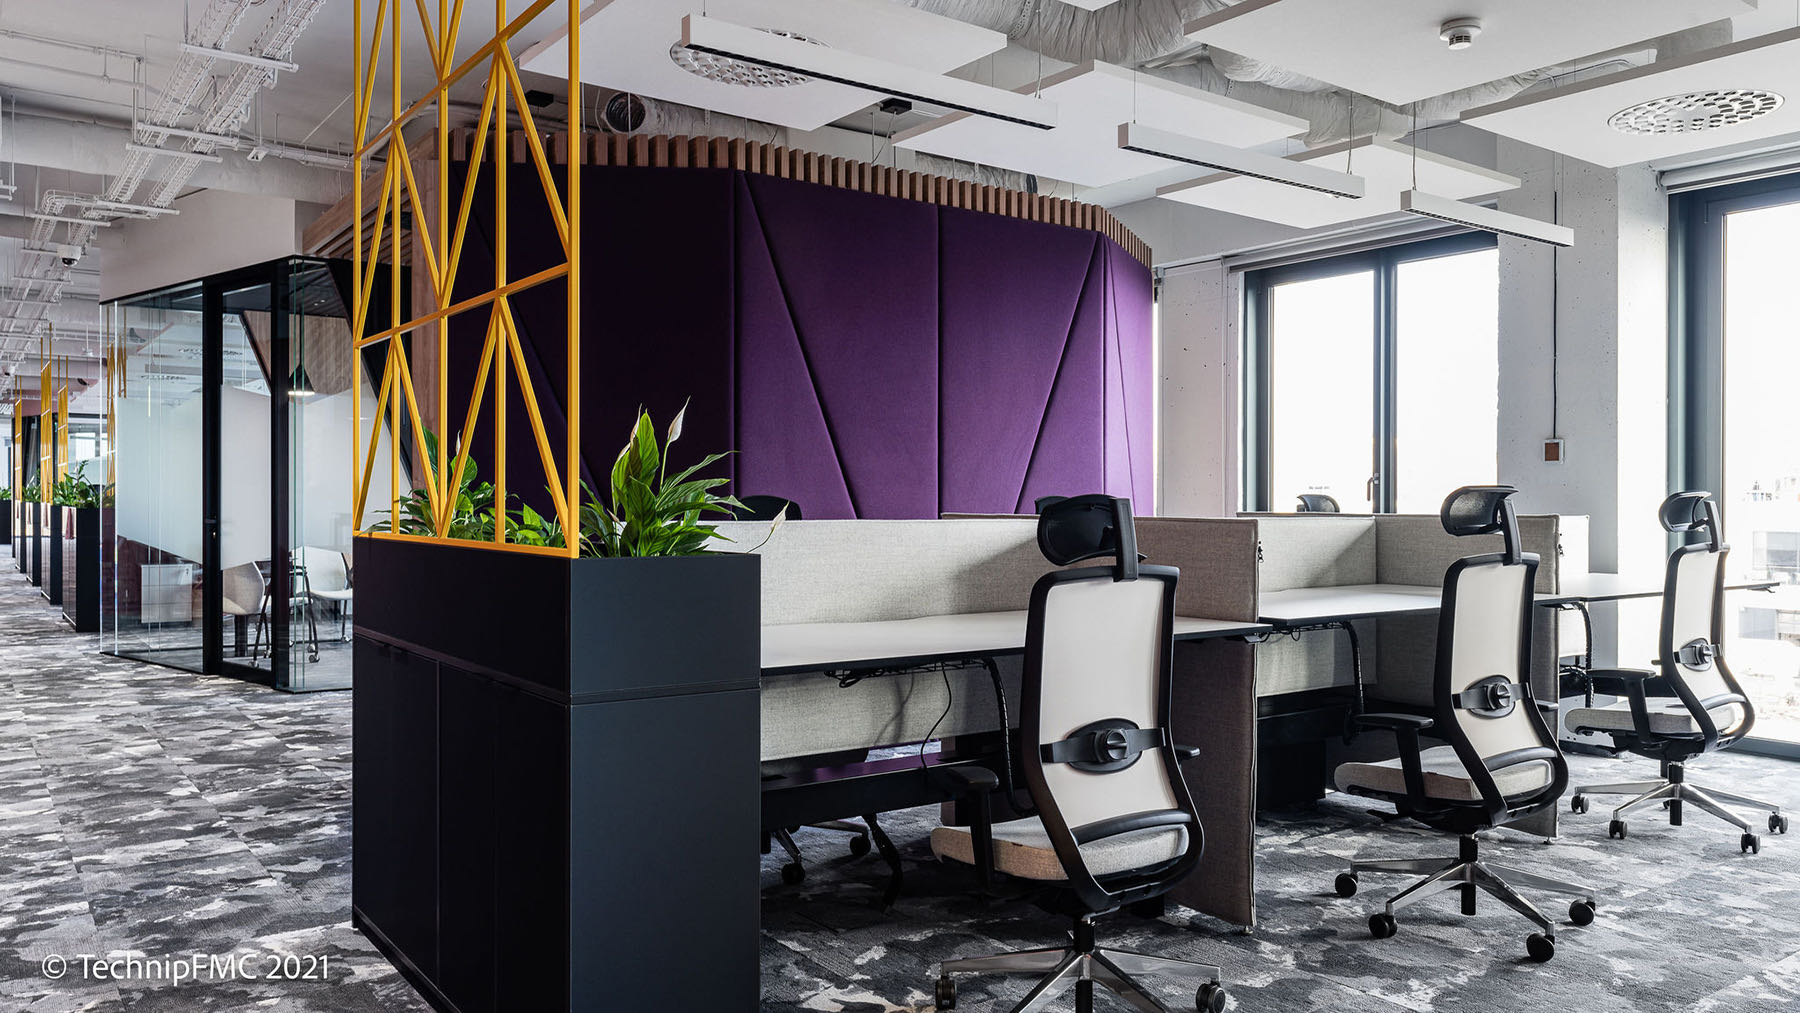 technip-fmc-krakow-office-13